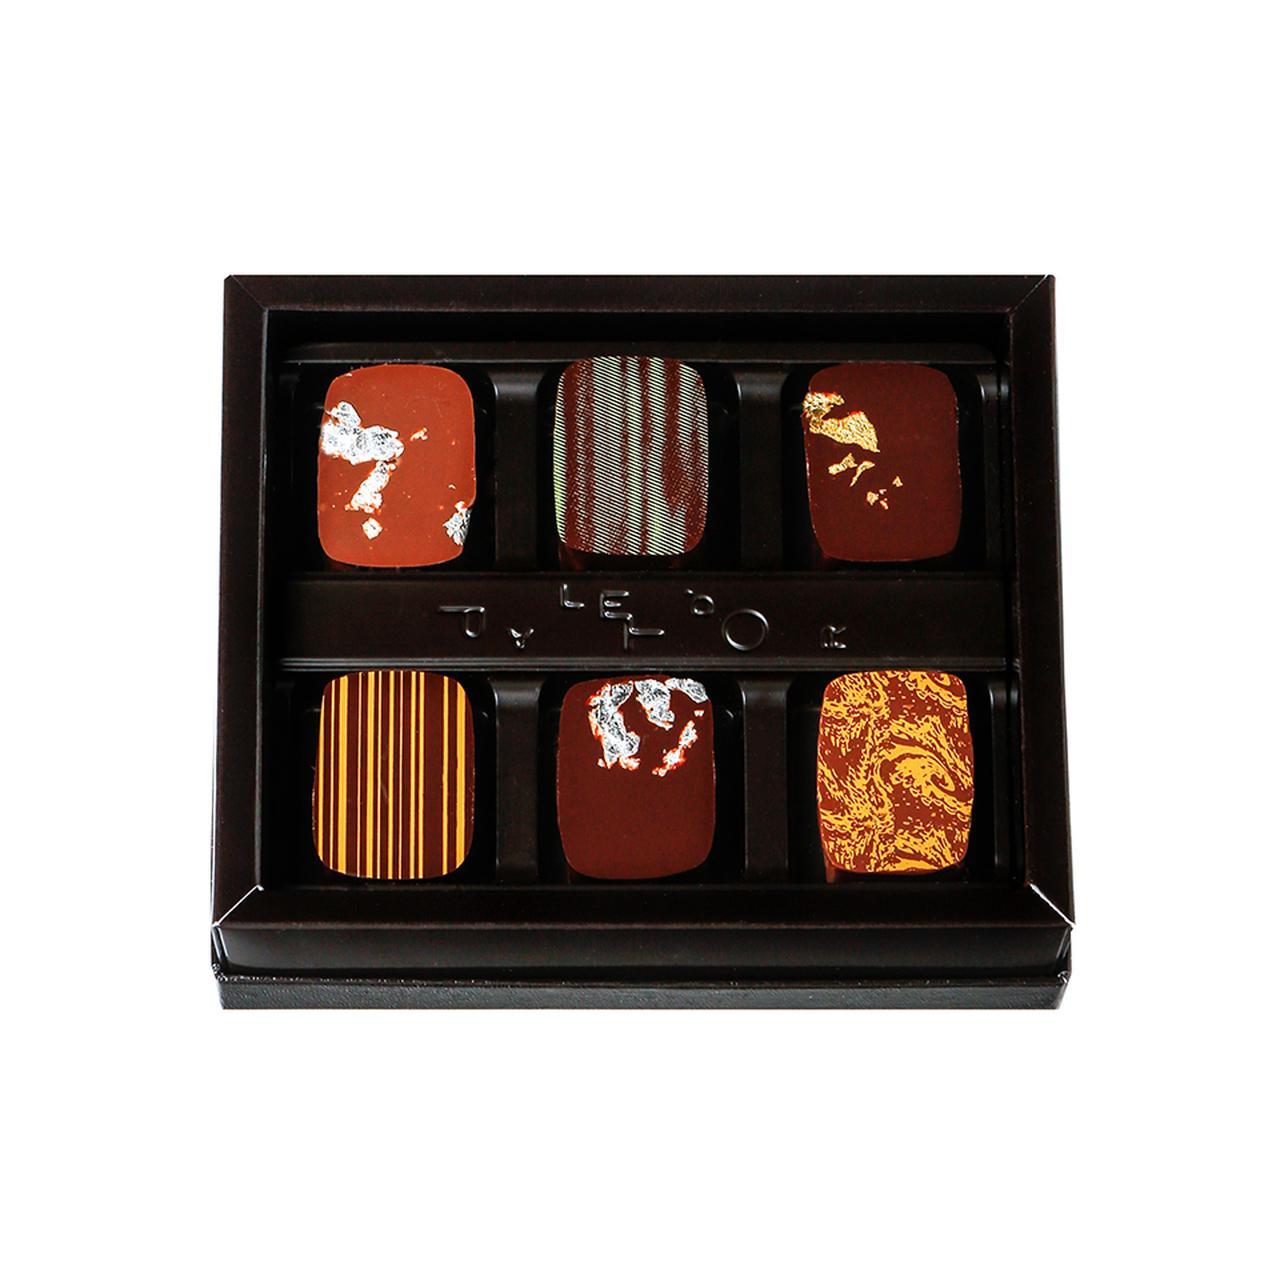 Images : 「宮城の酒蔵 利き酒ショコラ」¥2,000